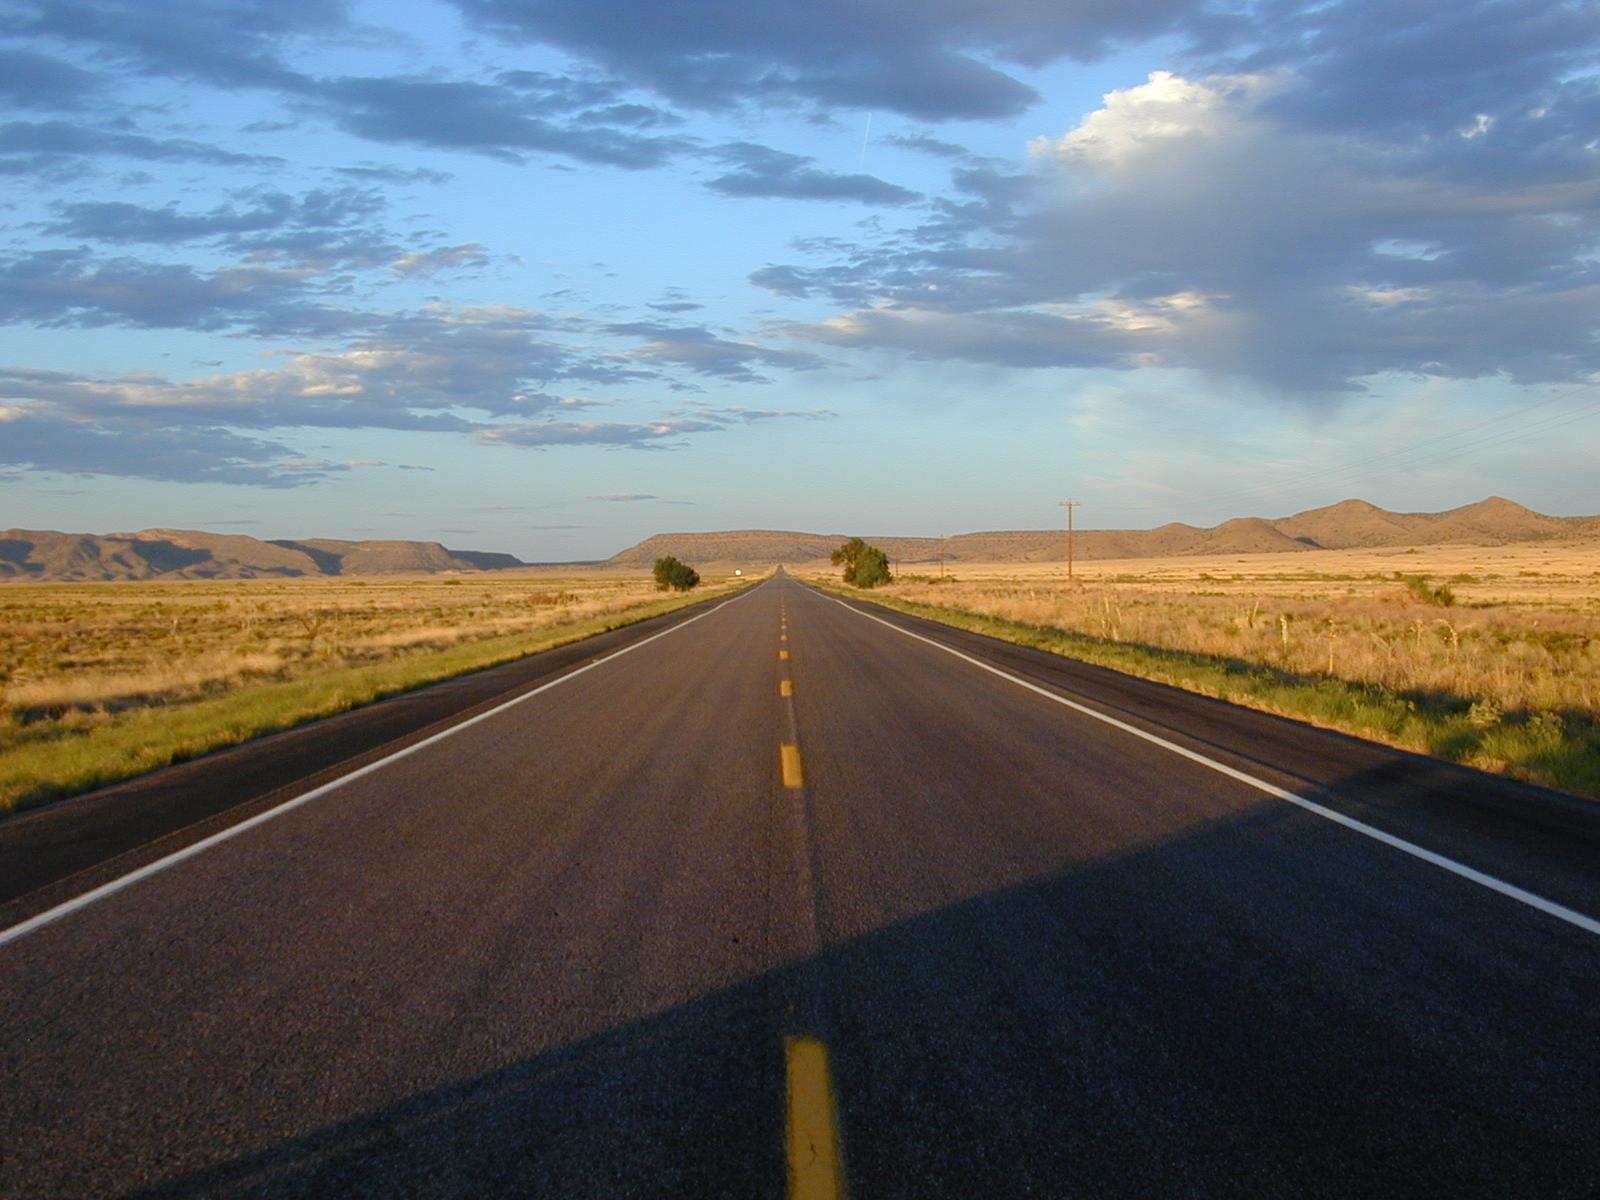 endless road - photo #5